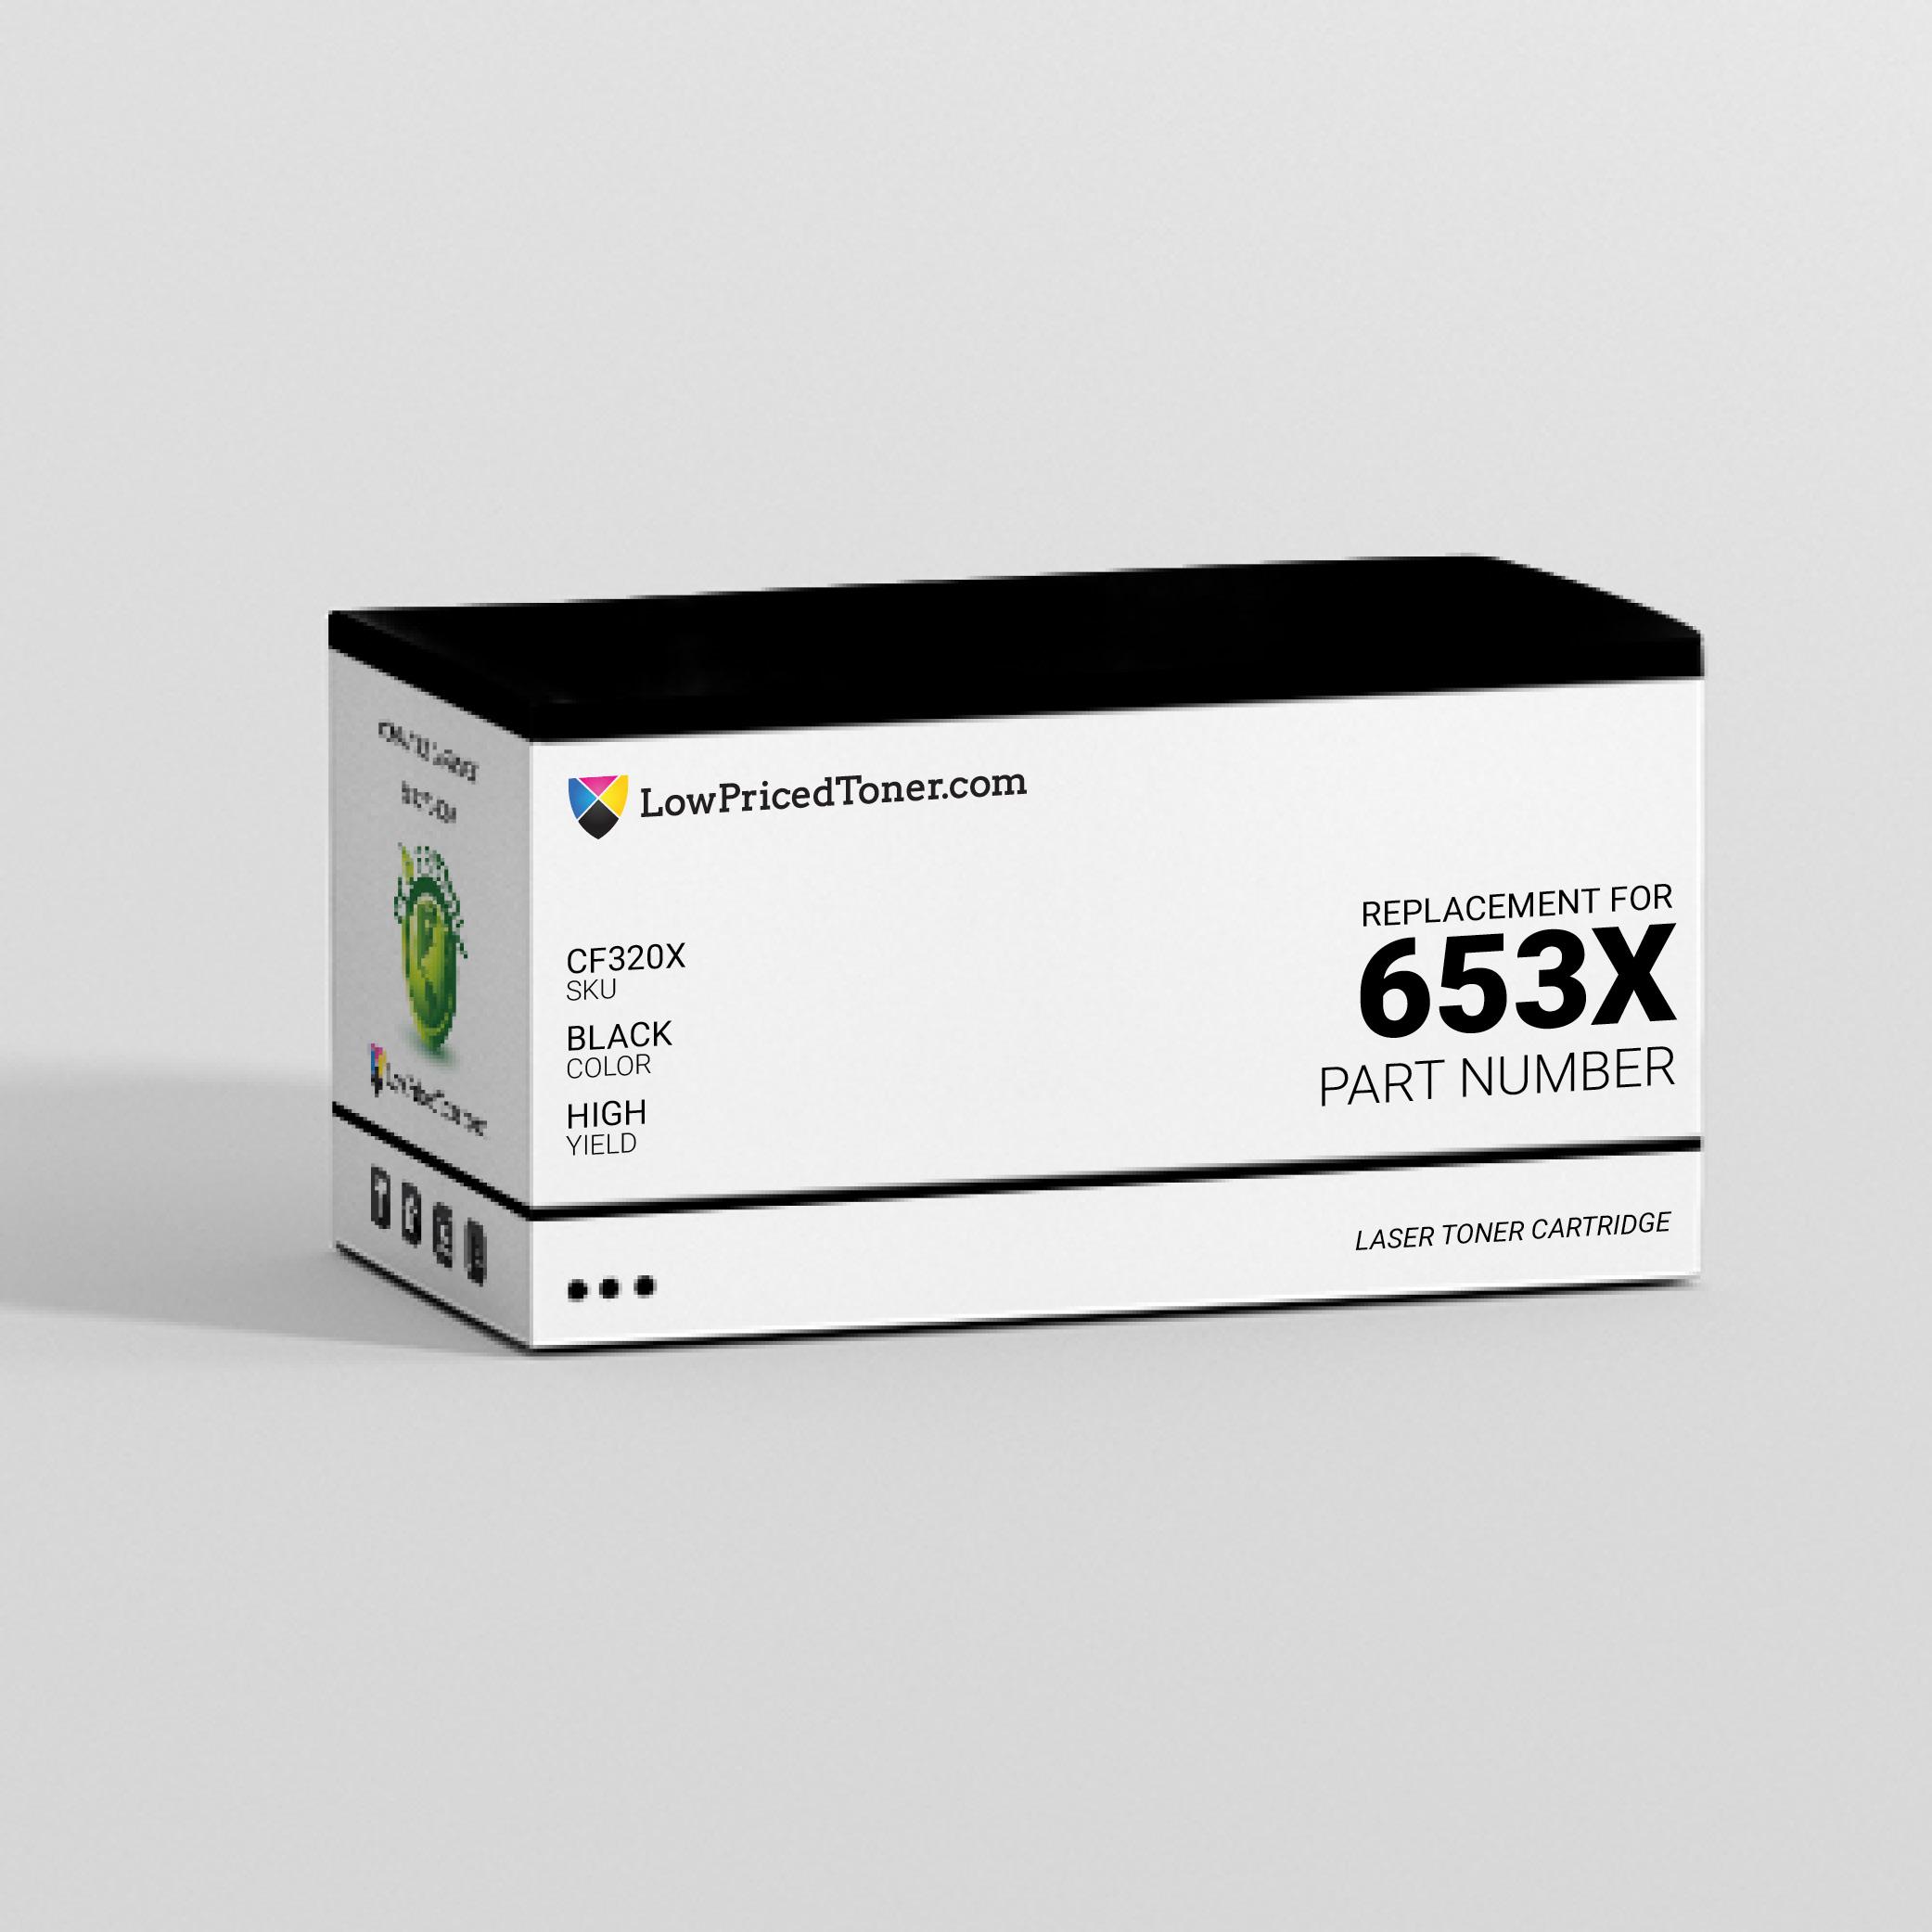 HP CF320X 653X Compatible Black Laser Toner Cartridge High Yield